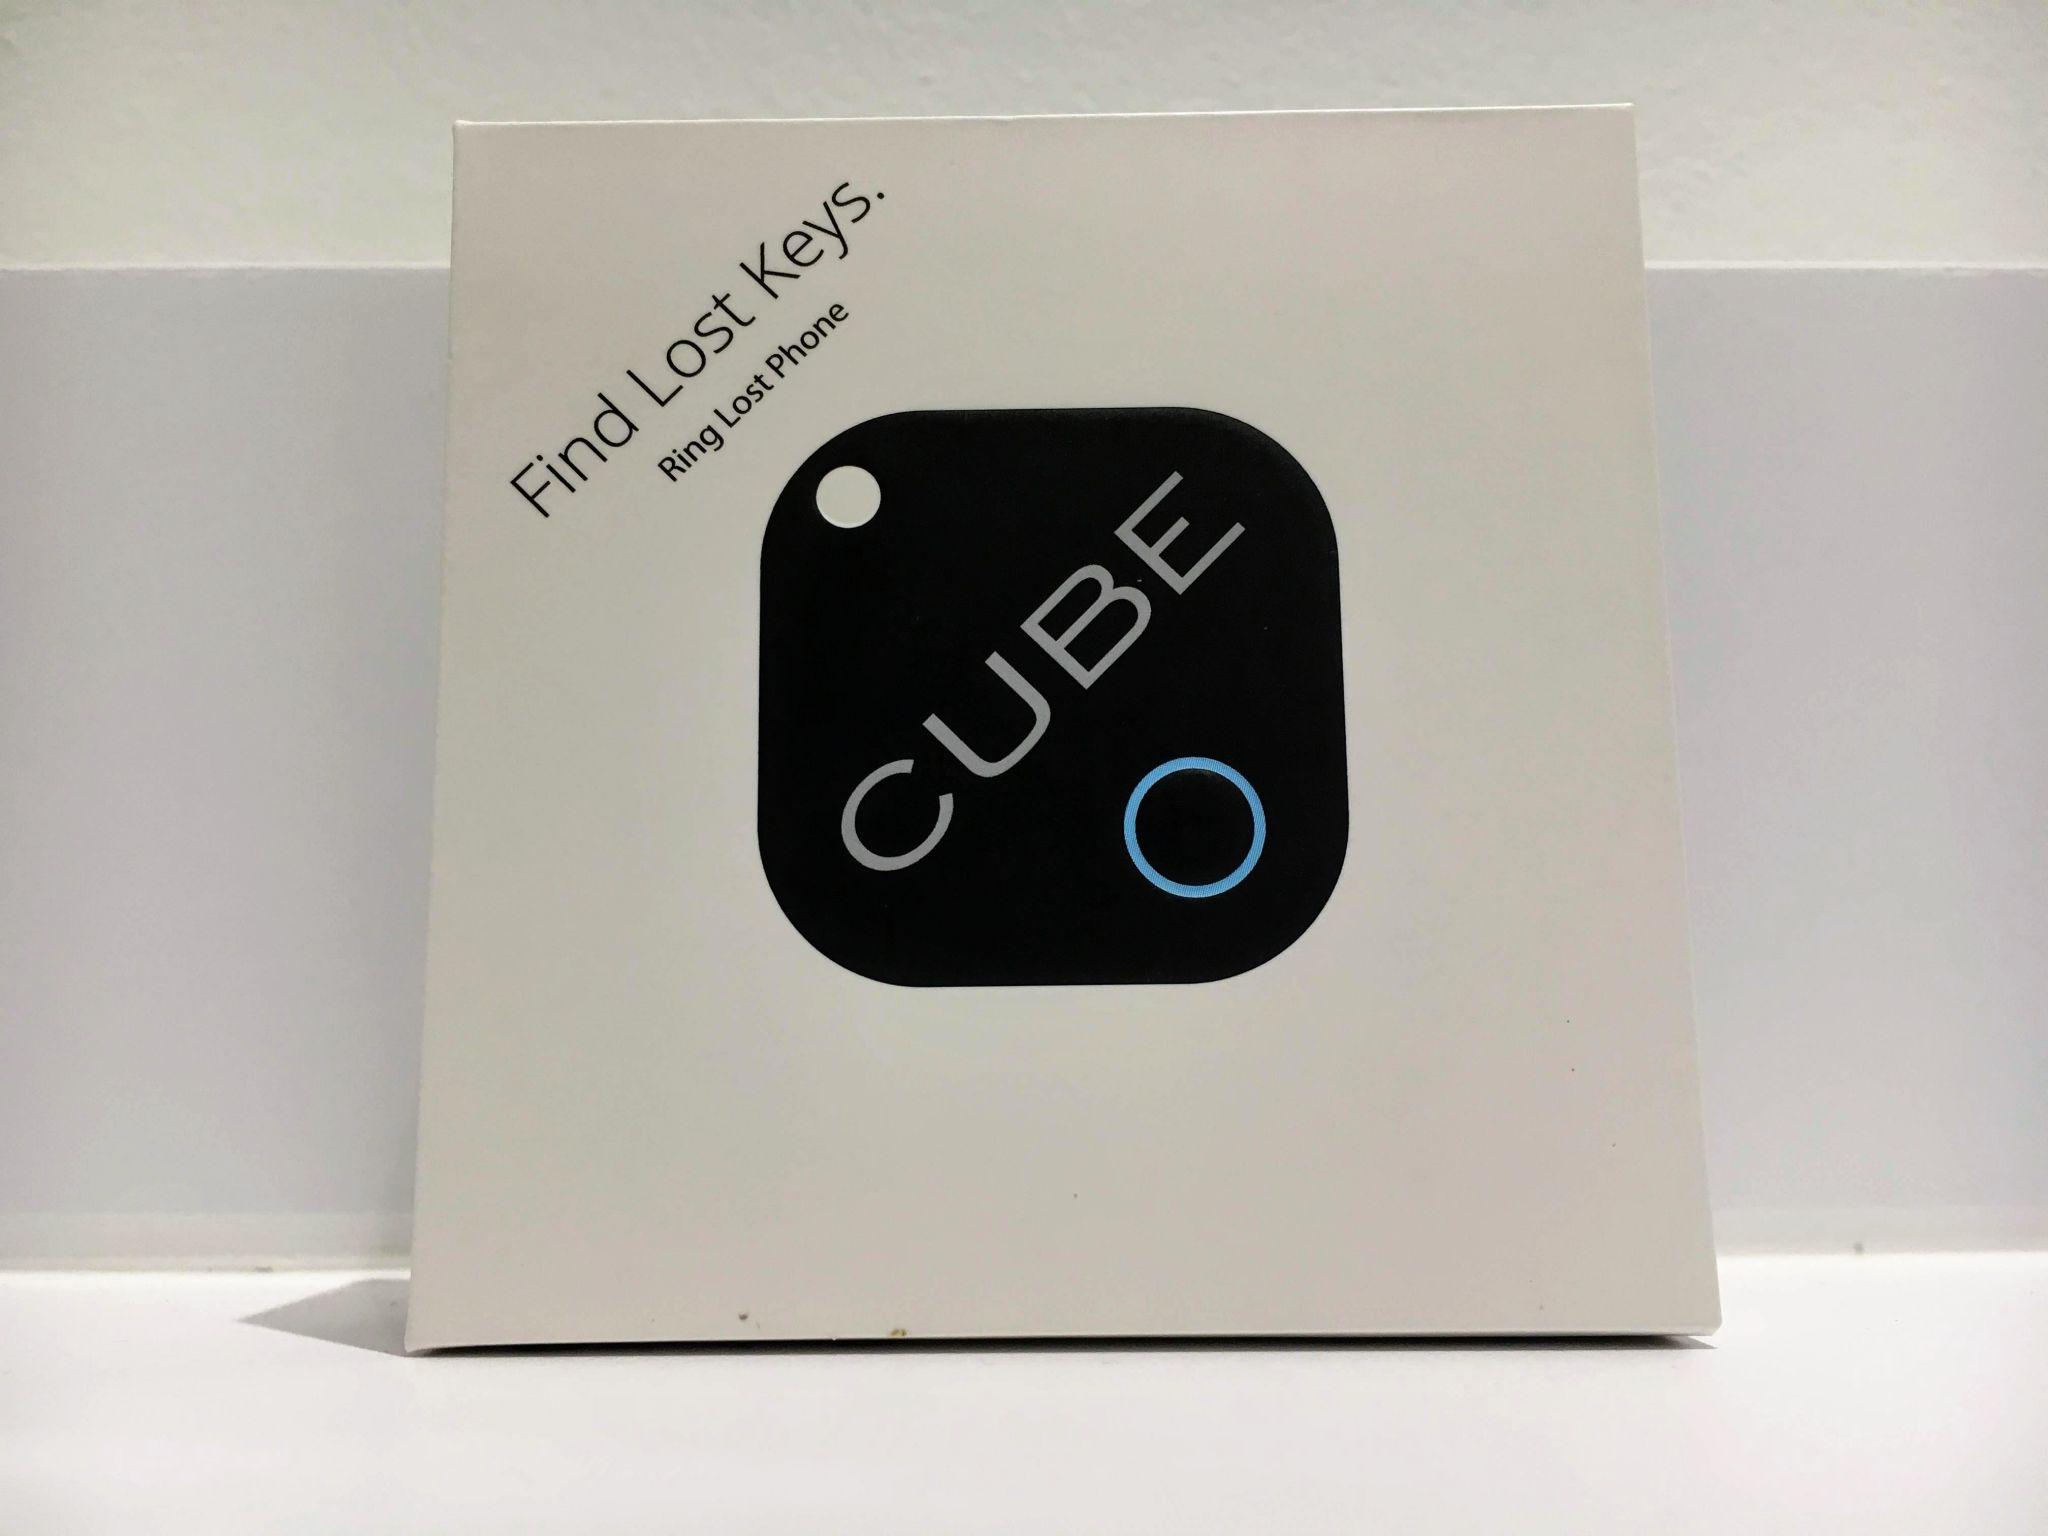 Cube Bluetooth Tracker Box